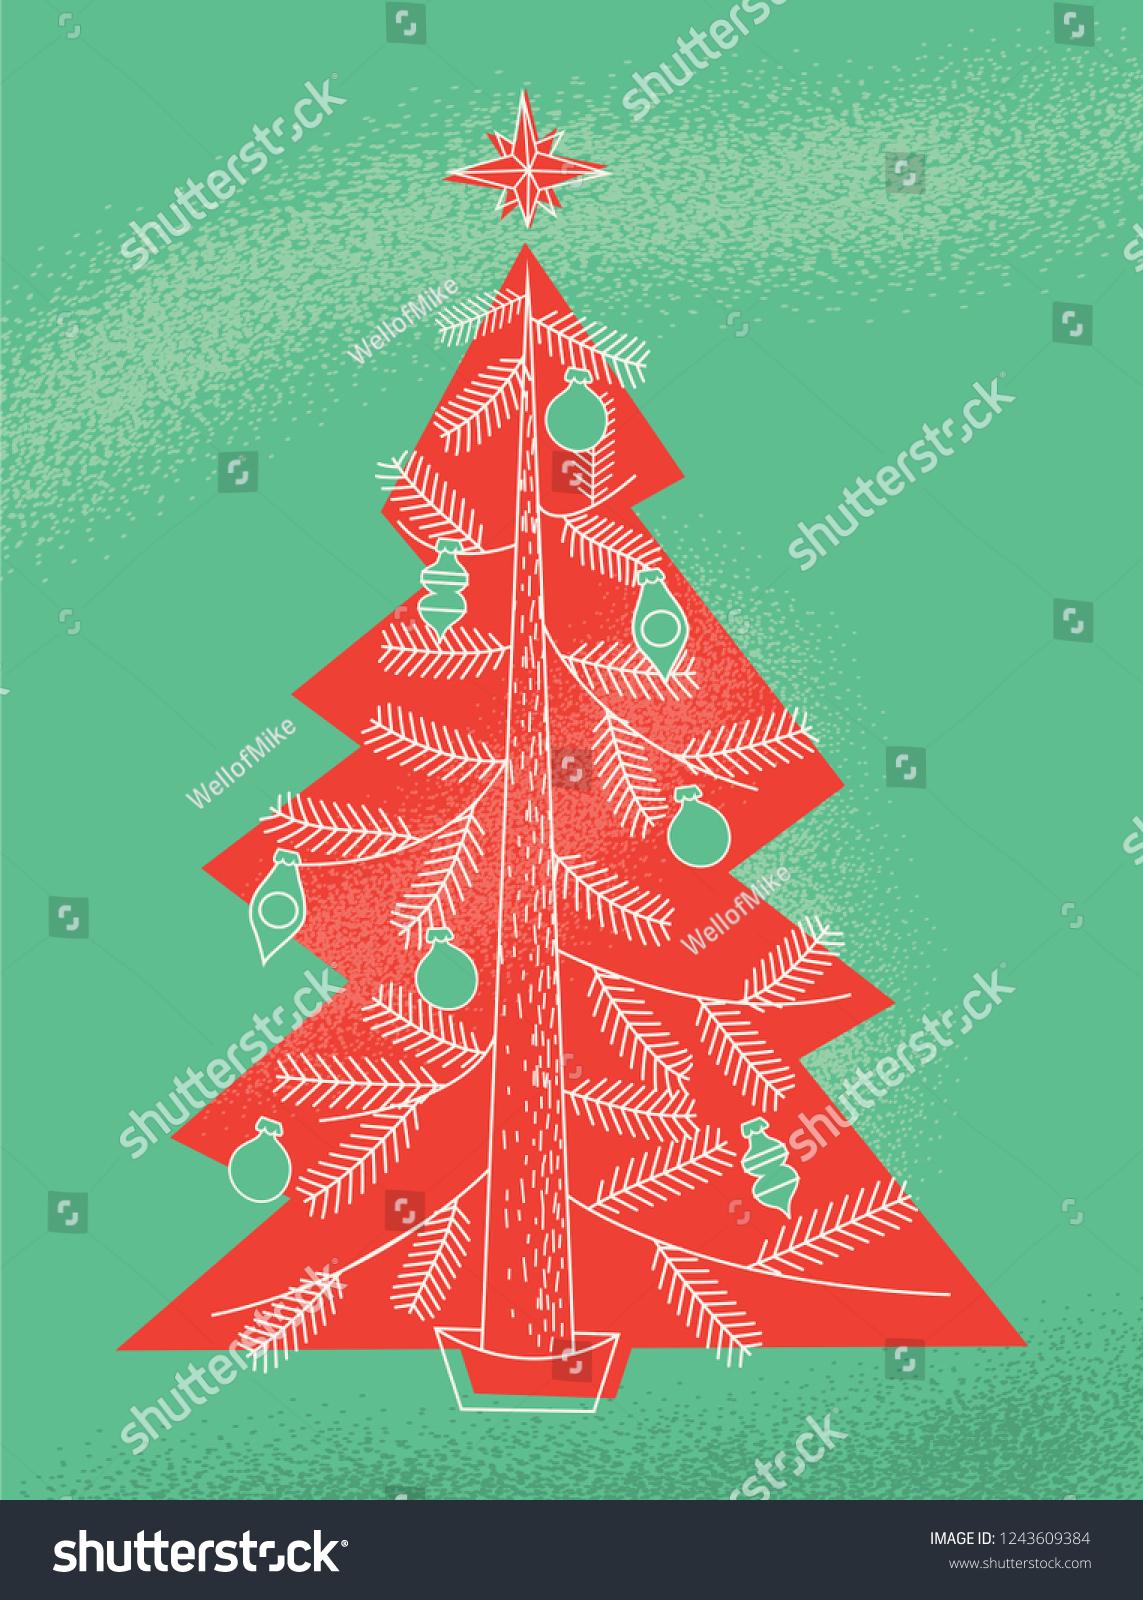 Retro Modern Illustration Christmas Tree Style Stock Vector Royalty Free 1243609384